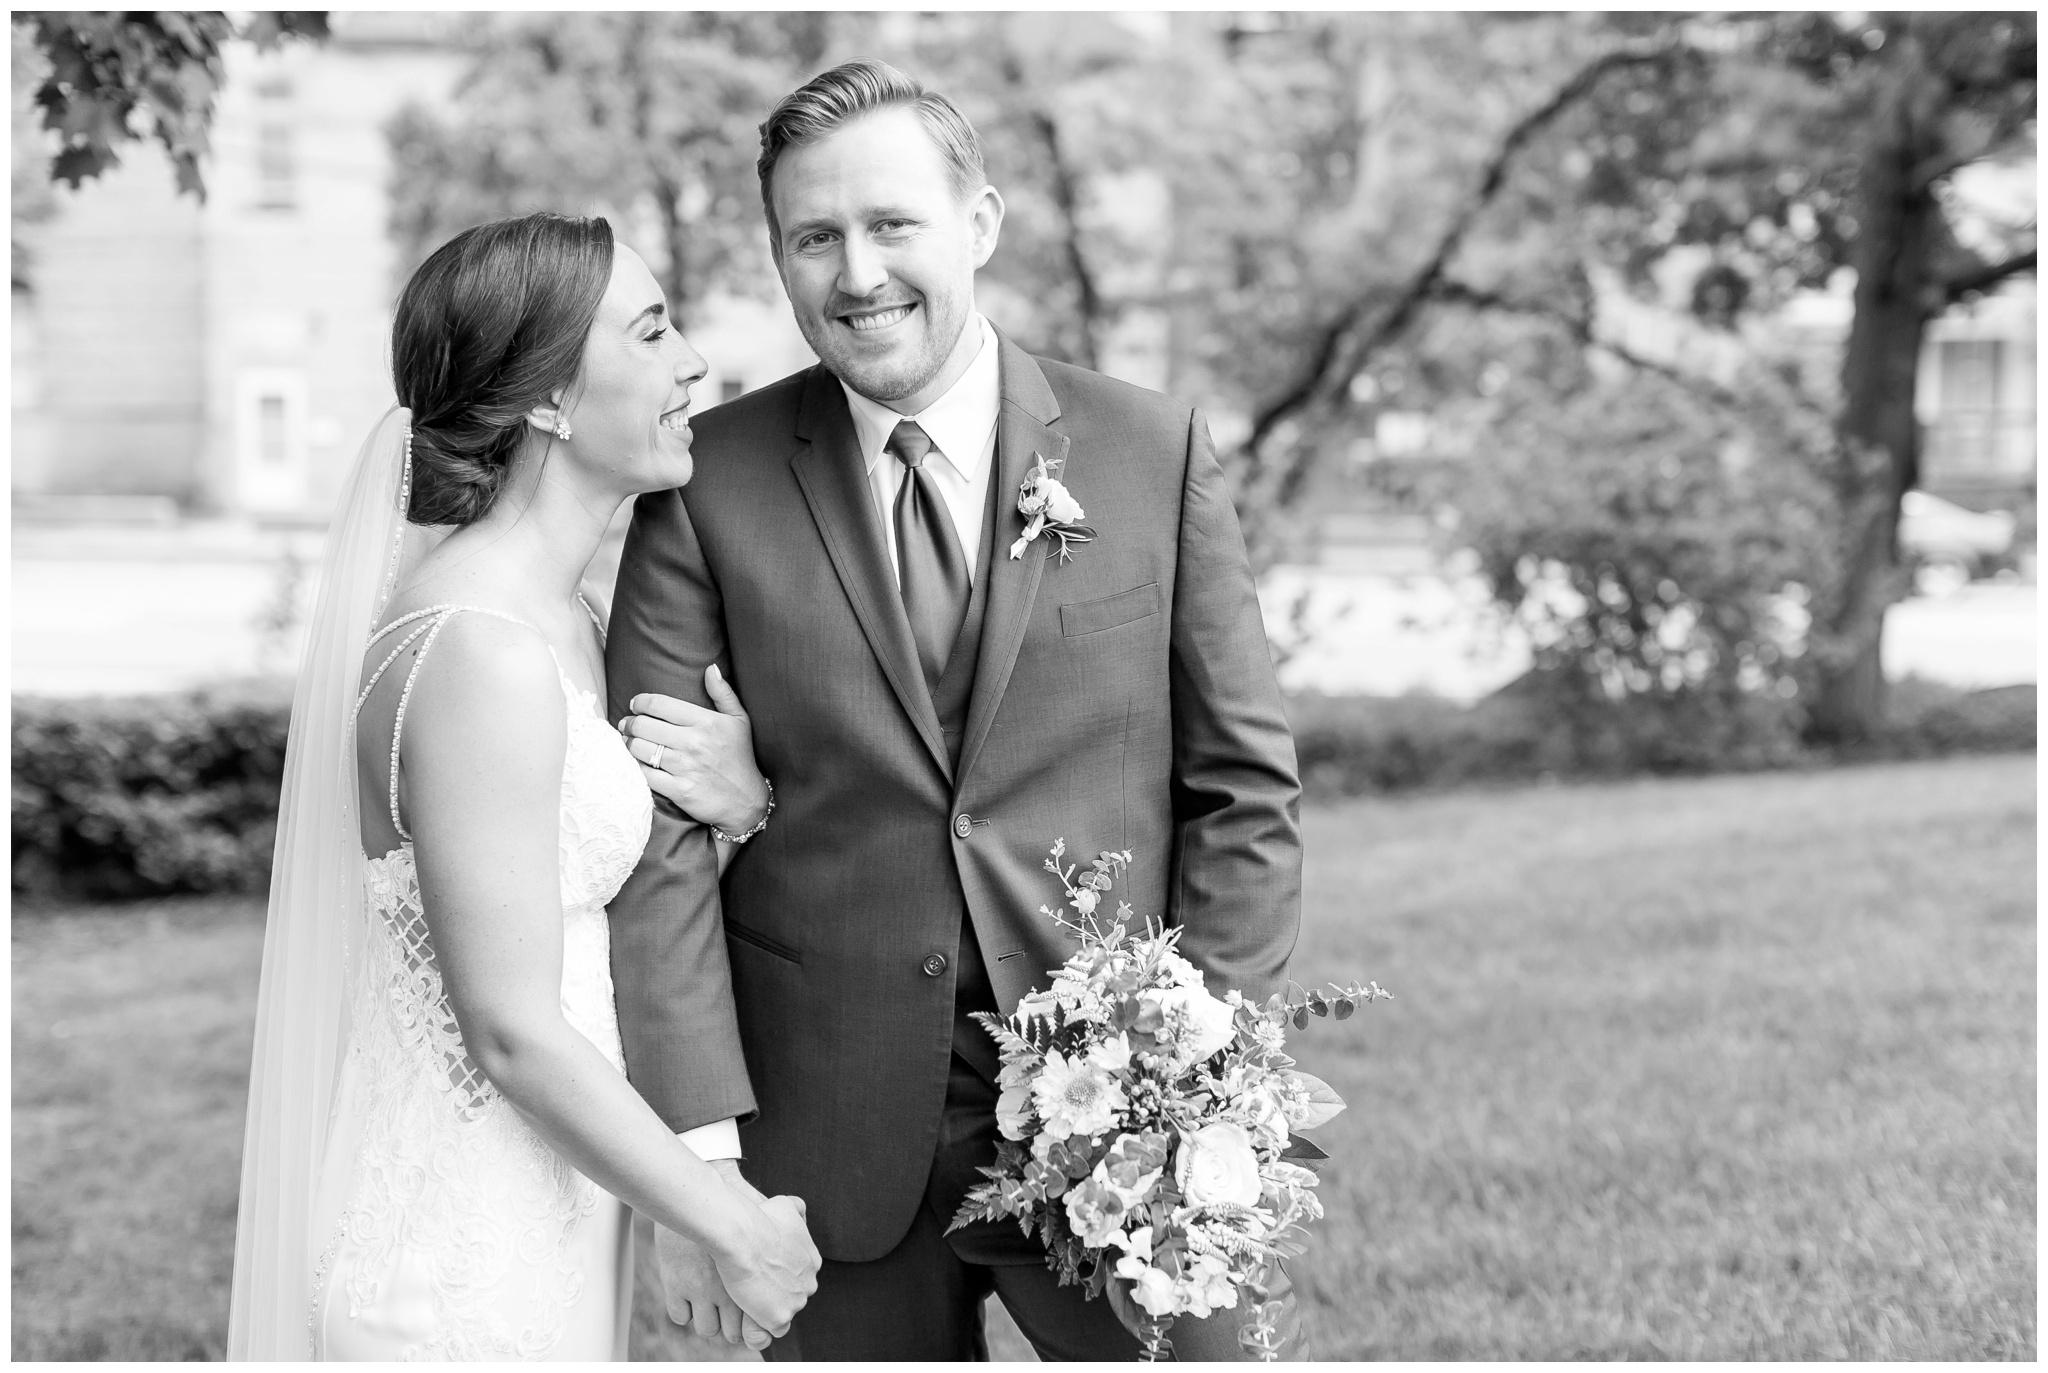 Union_south_Wedding_Madison_Wisconsin_Caynay_Photo_3647.jpg